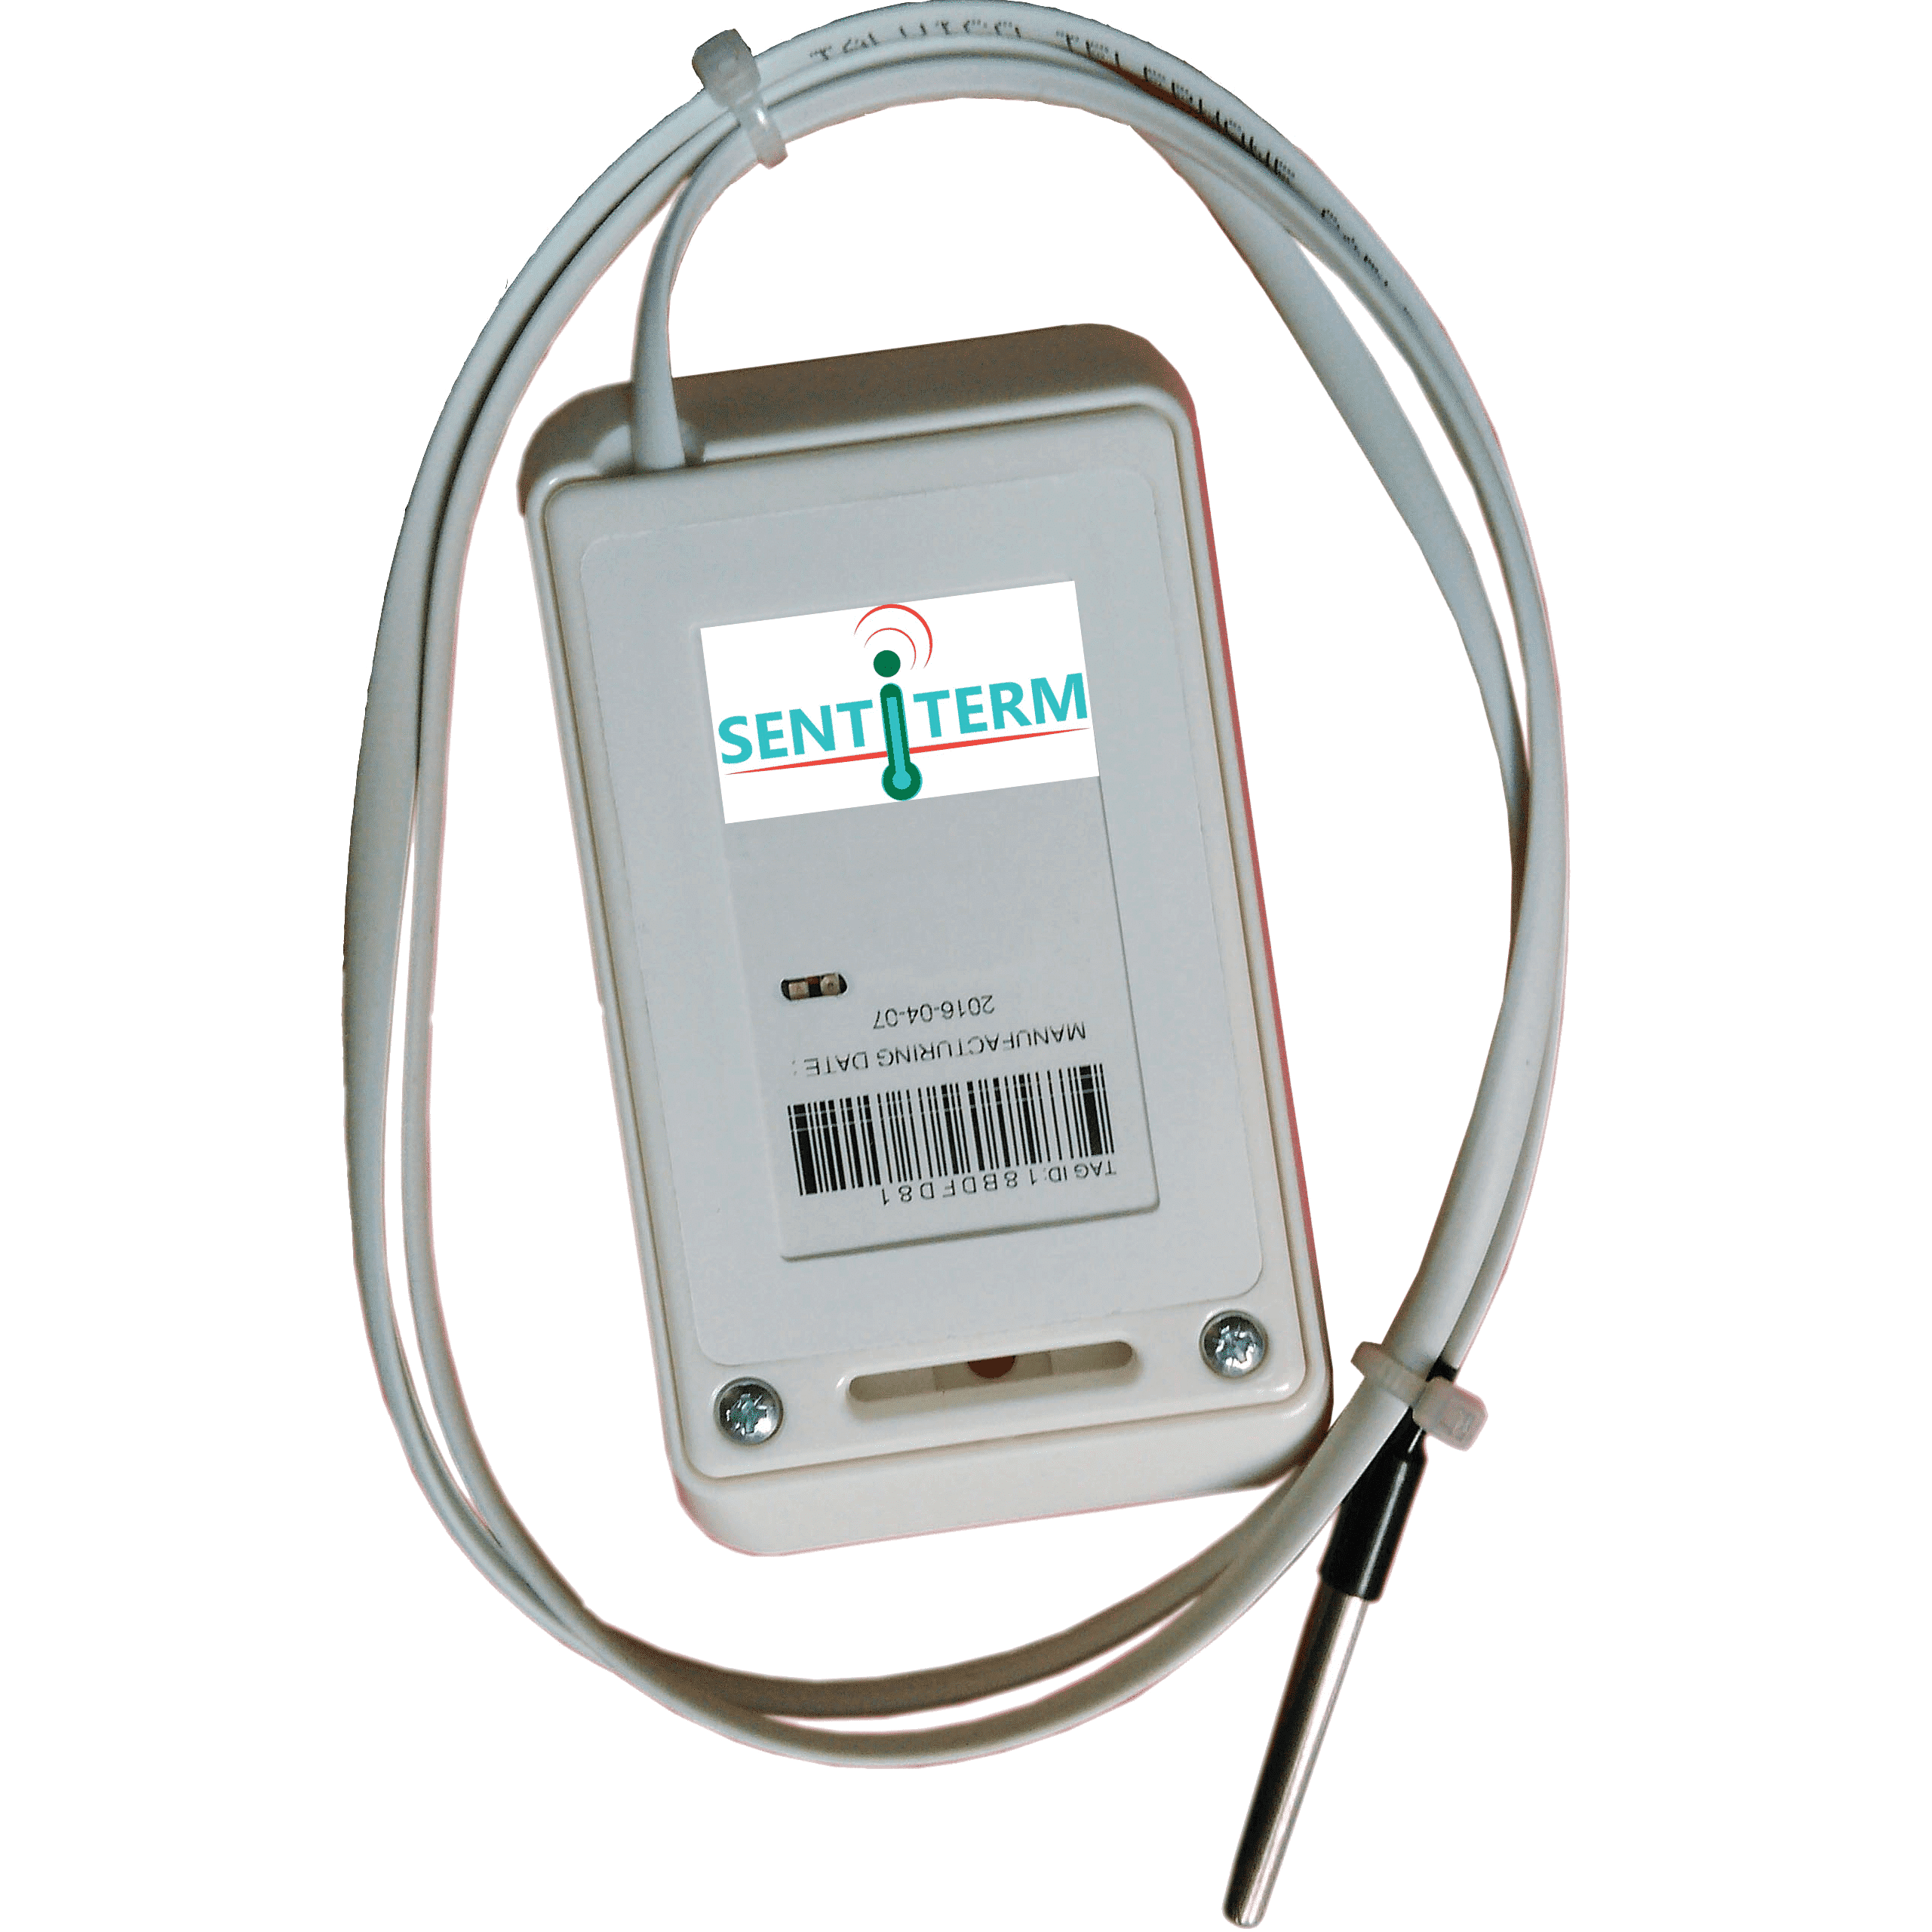 Sentiterm-NFC-sonde-2.png